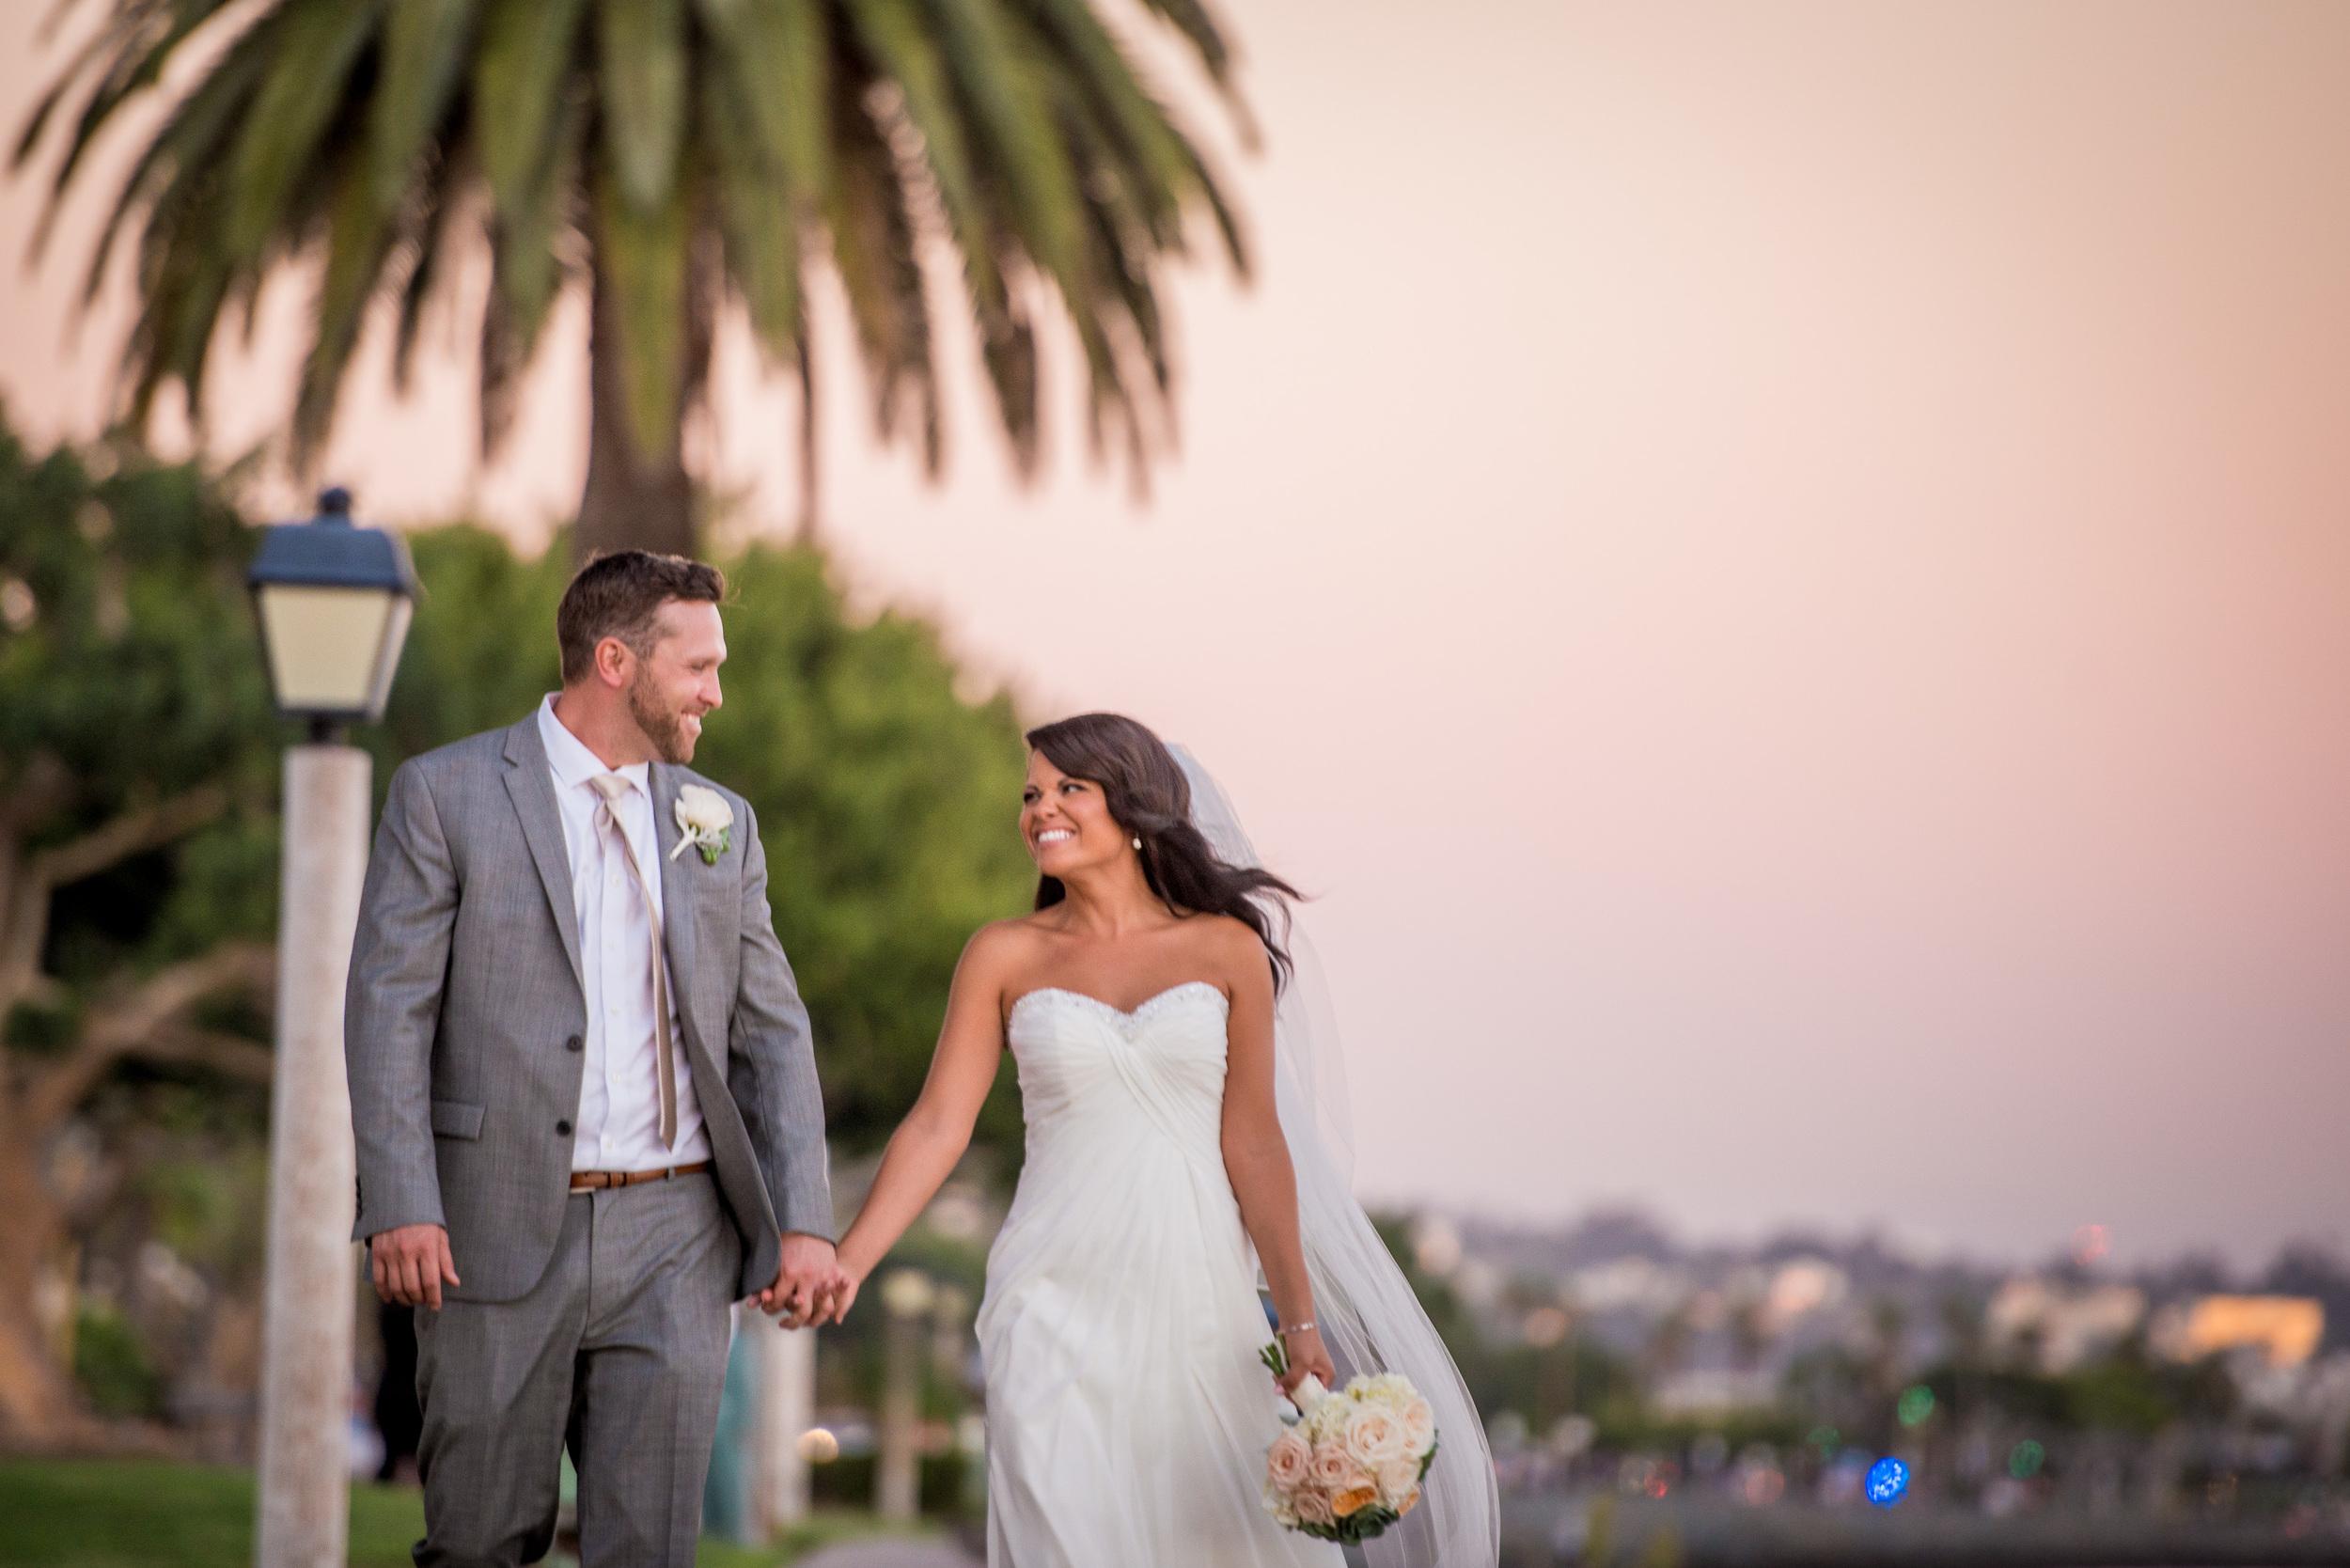 tom-hams-lighthouse-wedding-_D803158.jpg